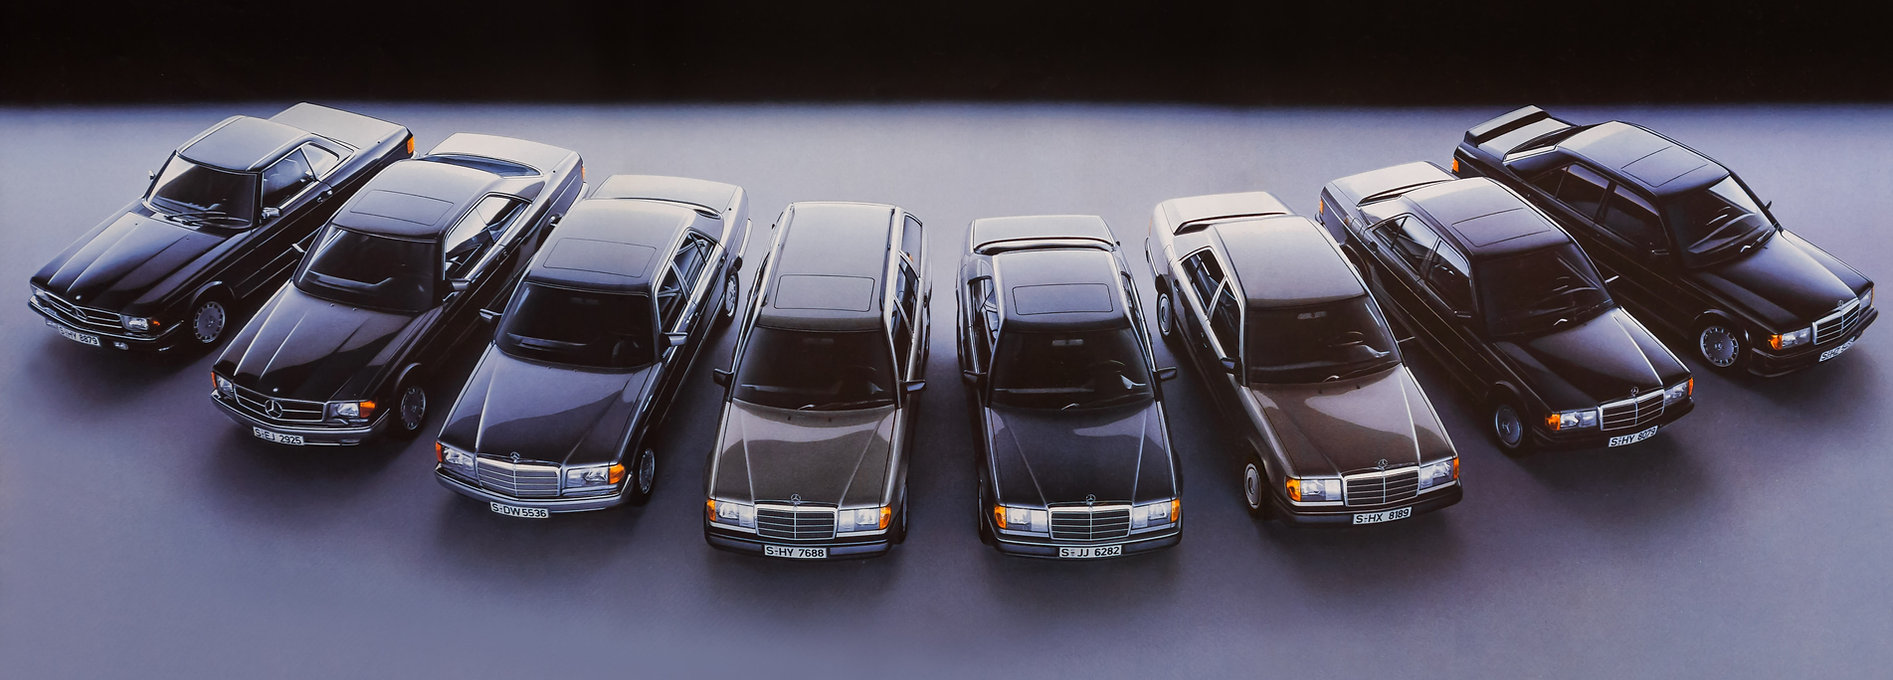 Mercedes-Benz auta klasyczne